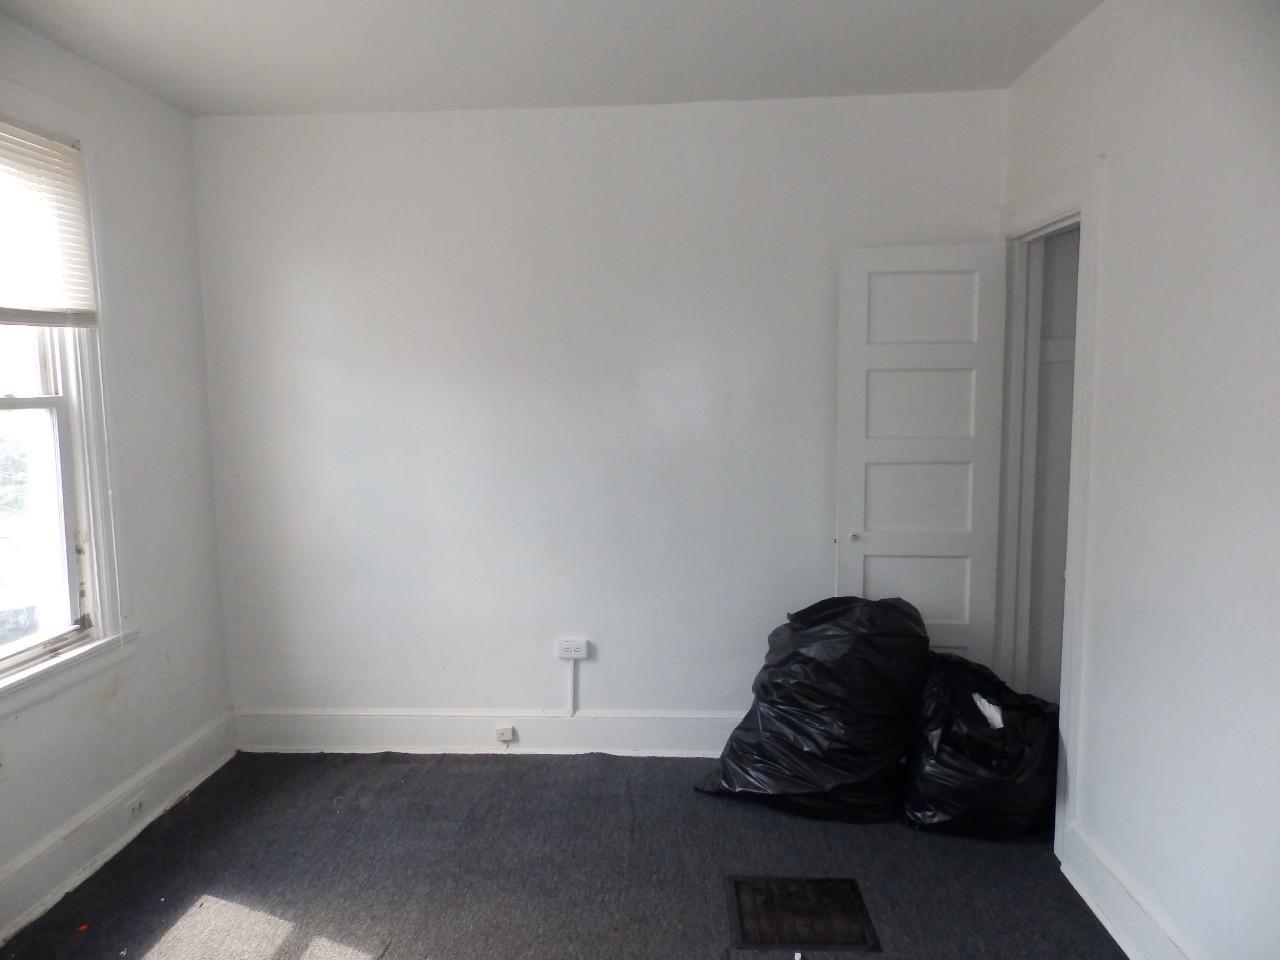 09 - Bedroom 1.JPG